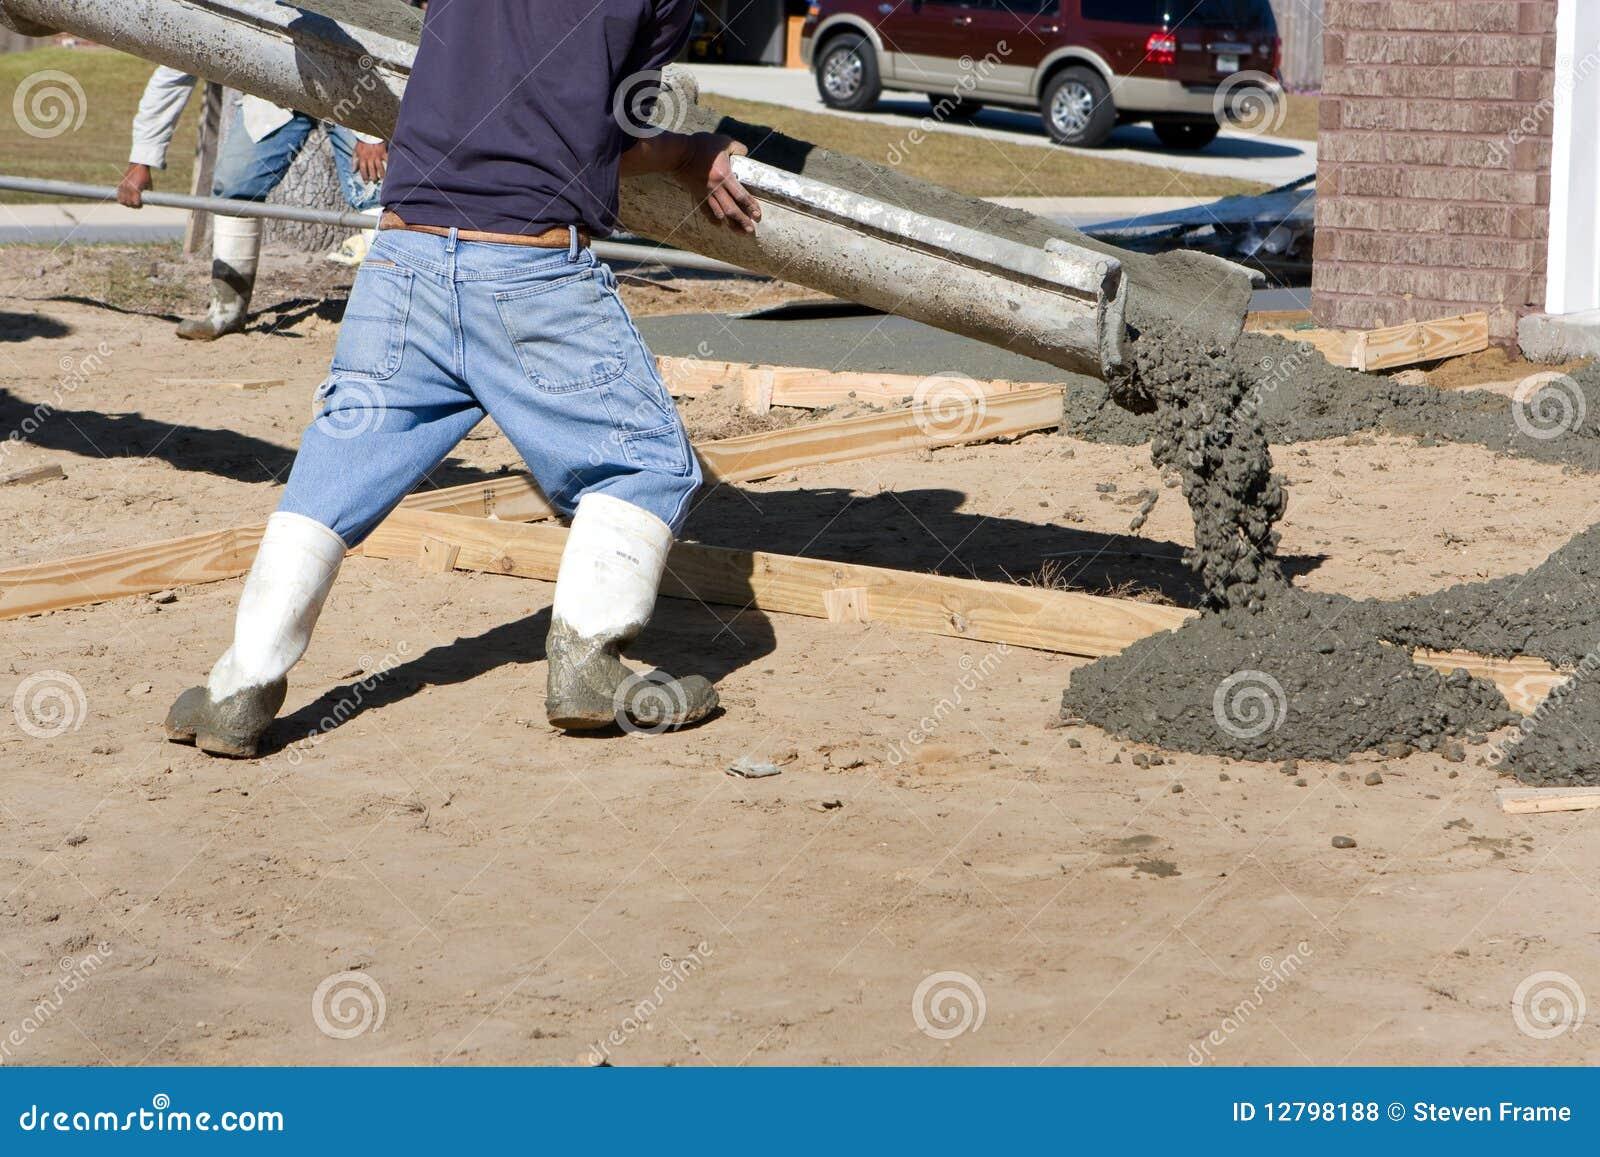 Pouring concrete driveway royalty free stock photos for Pouring concrete driveway